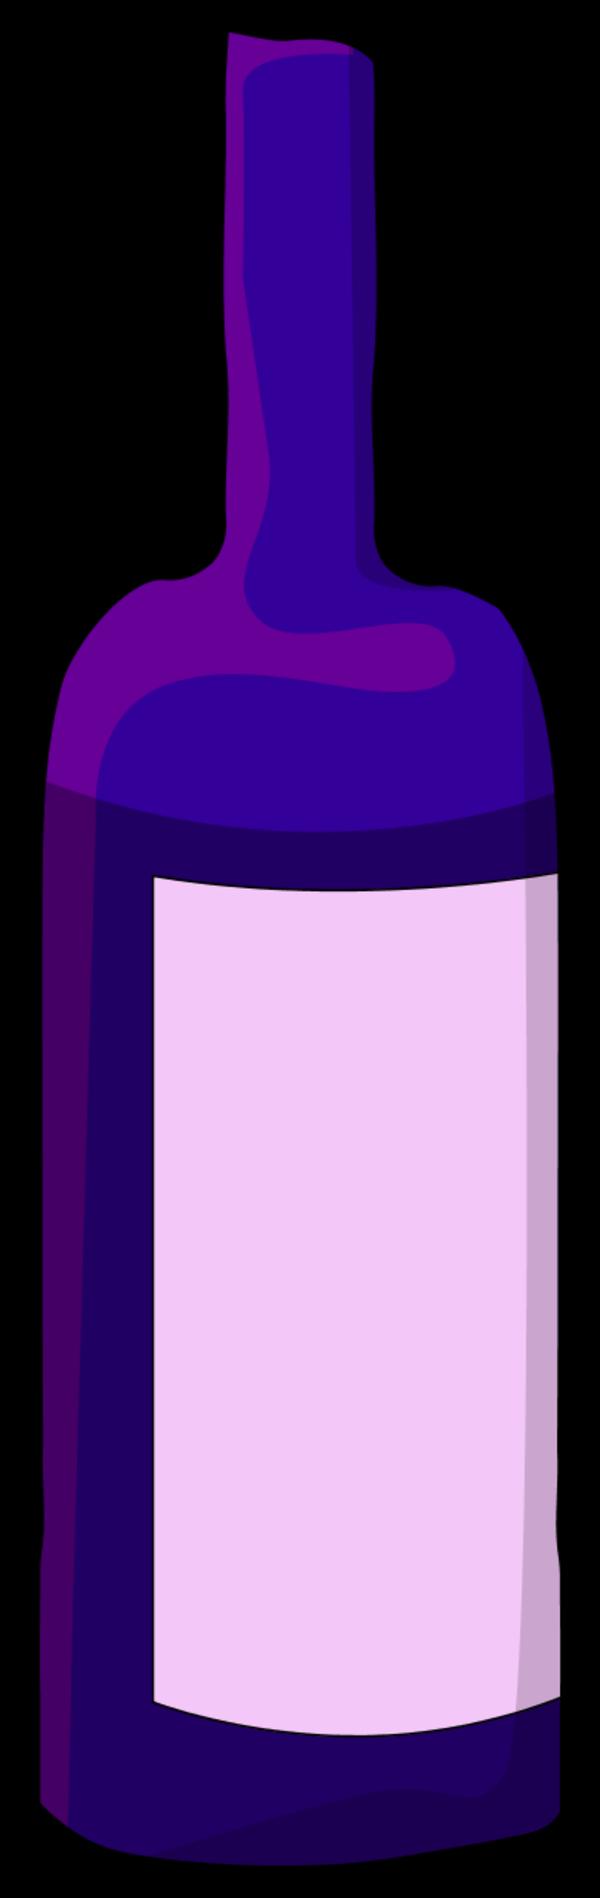 Drinking clipart bottleclip. Wine bottle silhouette clip